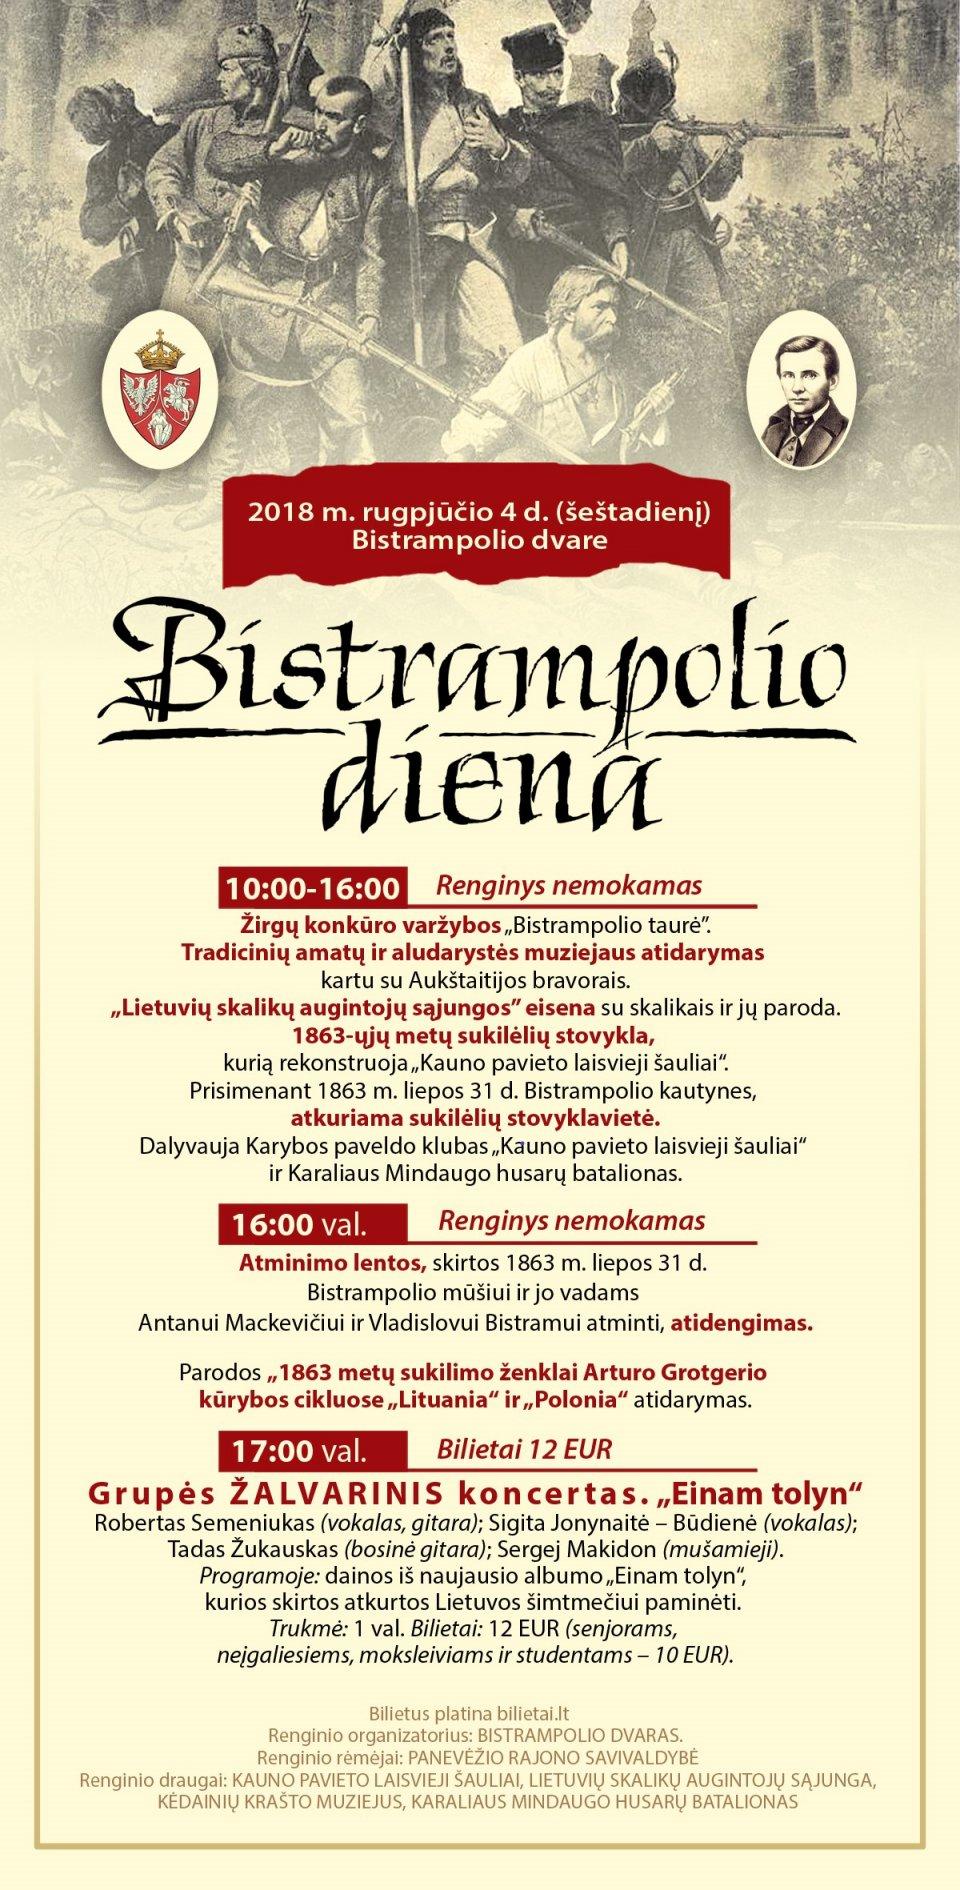 Bistrampolio-diena-facebook-960x1890.jpg